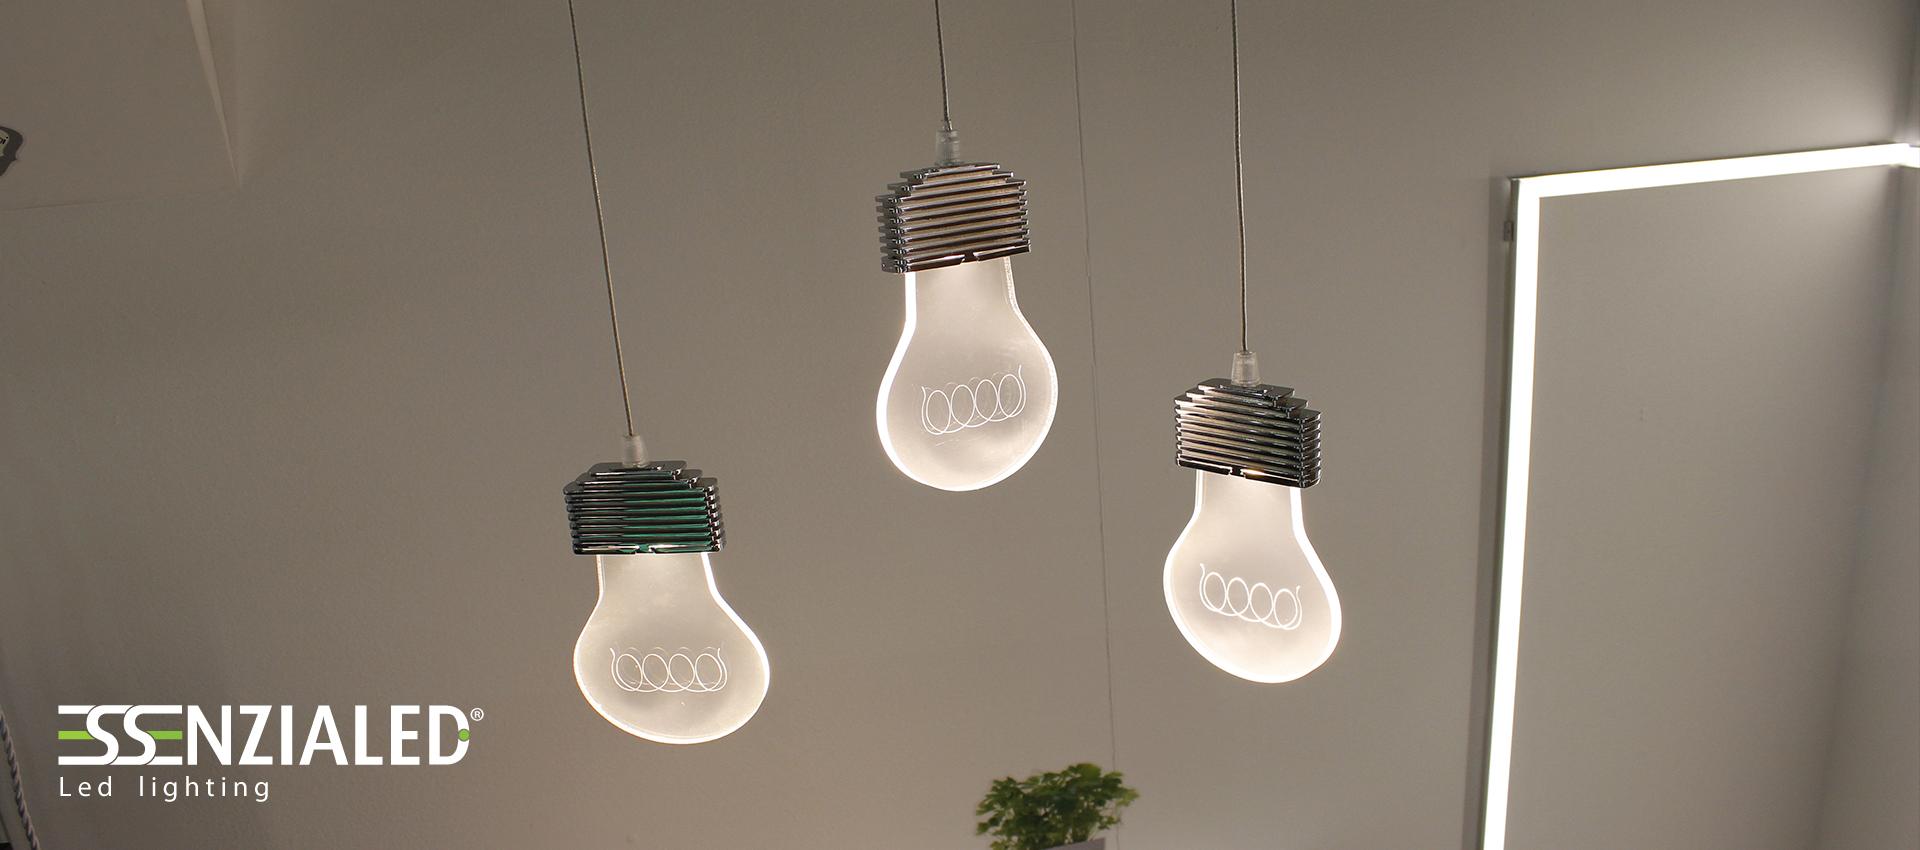 Lampade Led sospensioneEssenzialed – Illuminazione a led